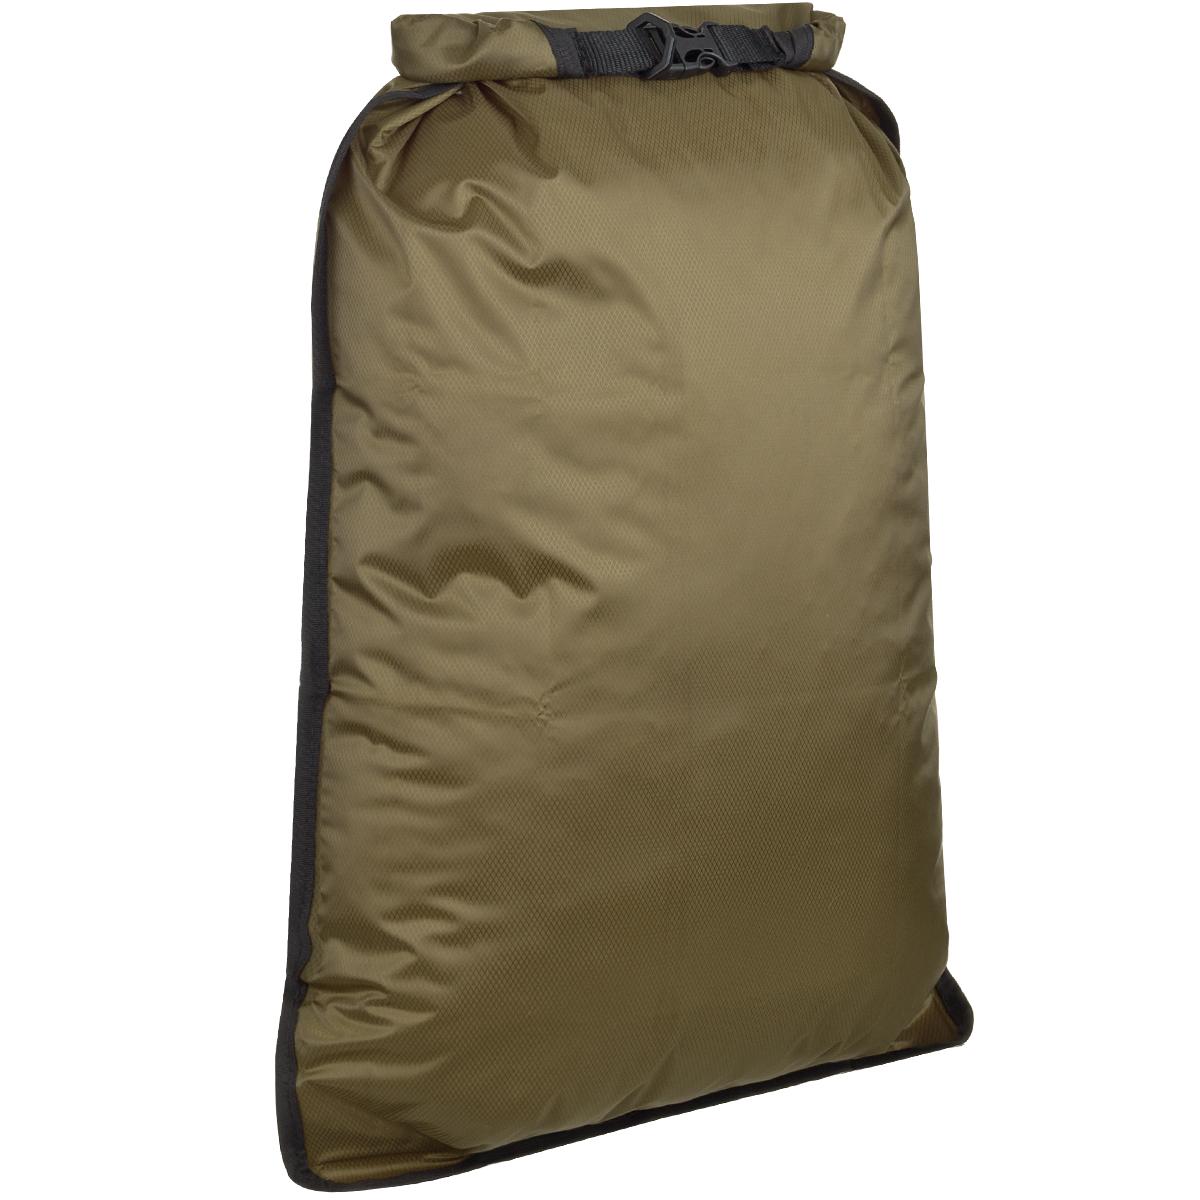 Details About Mfh Waterproof Duffle Bag 20l Beach Knapsack Canoe Sailing Dry Od Green